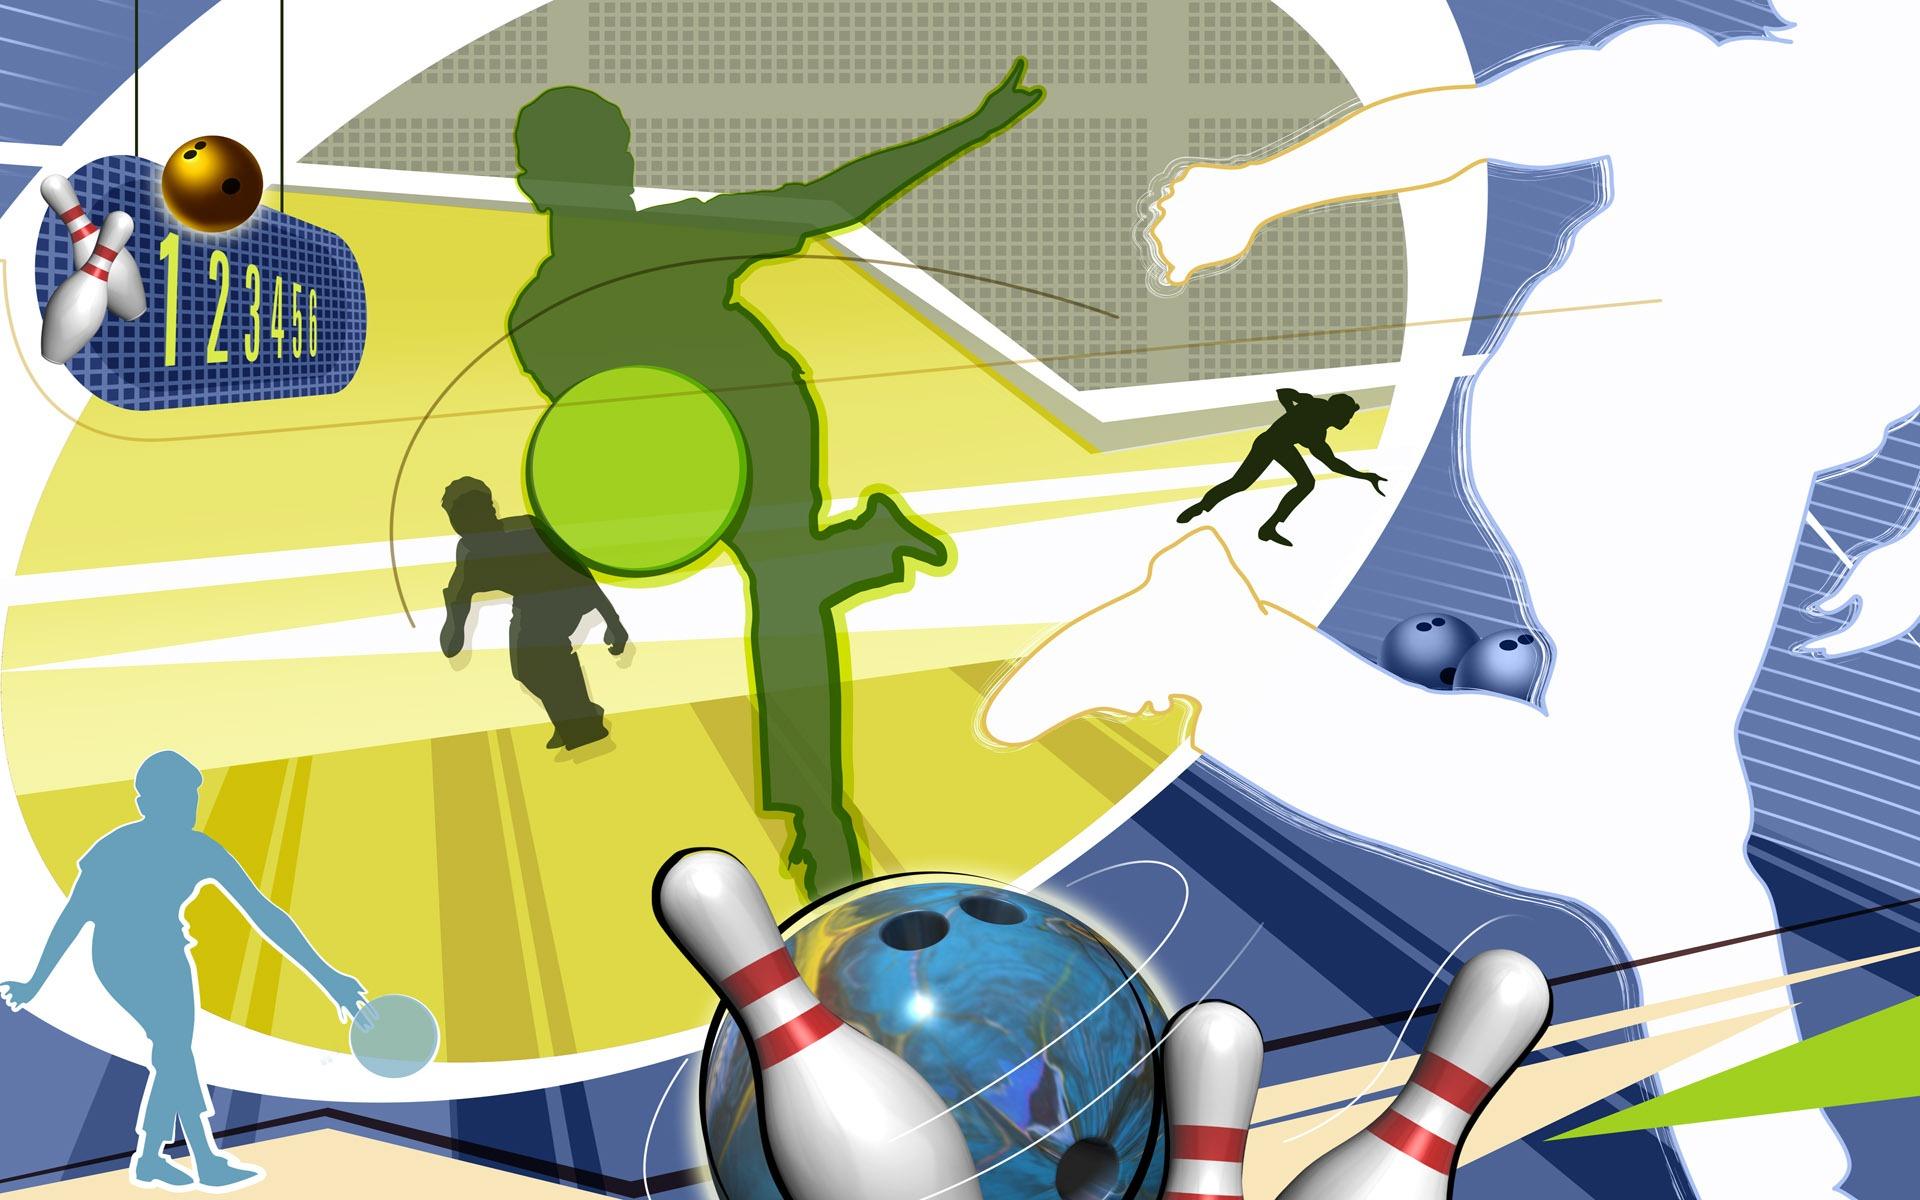 Fondo Con Iconos De Deporte: Pantalla Ancha De Fondos De Escritorio De Deporte (2) #4